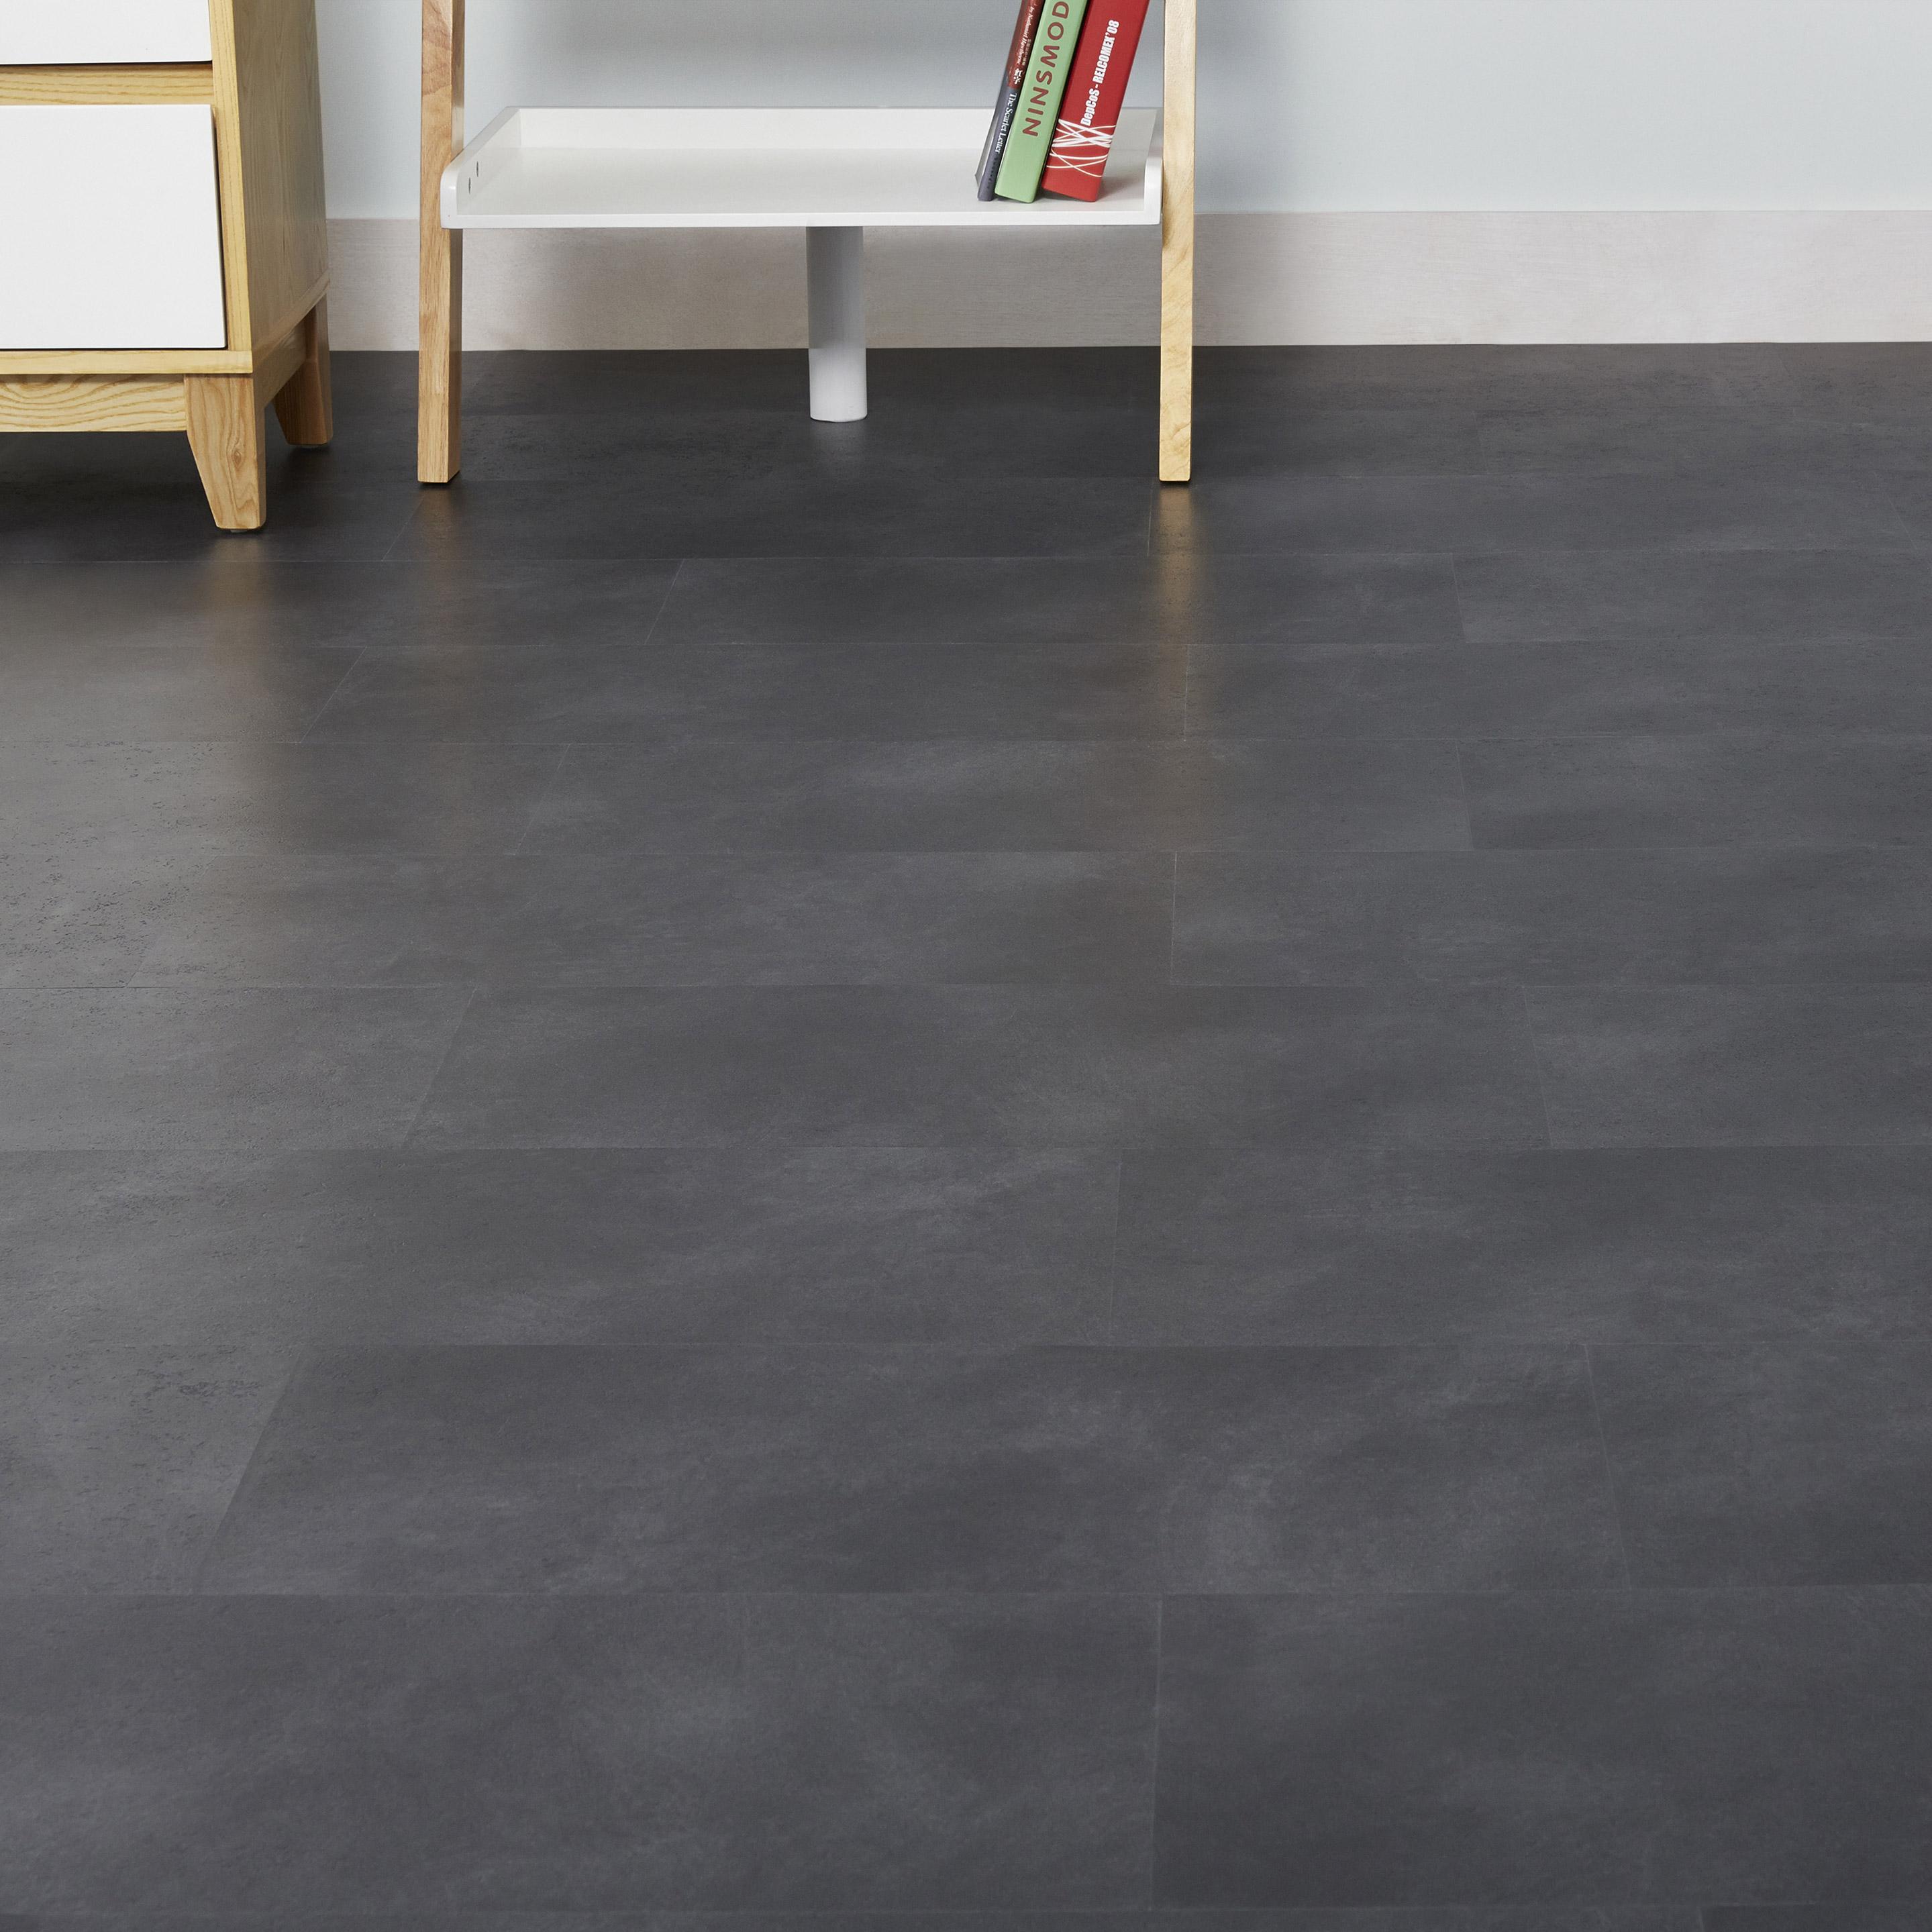 Dalle PVC clipsable effet beton anthracite ARTENS Moods